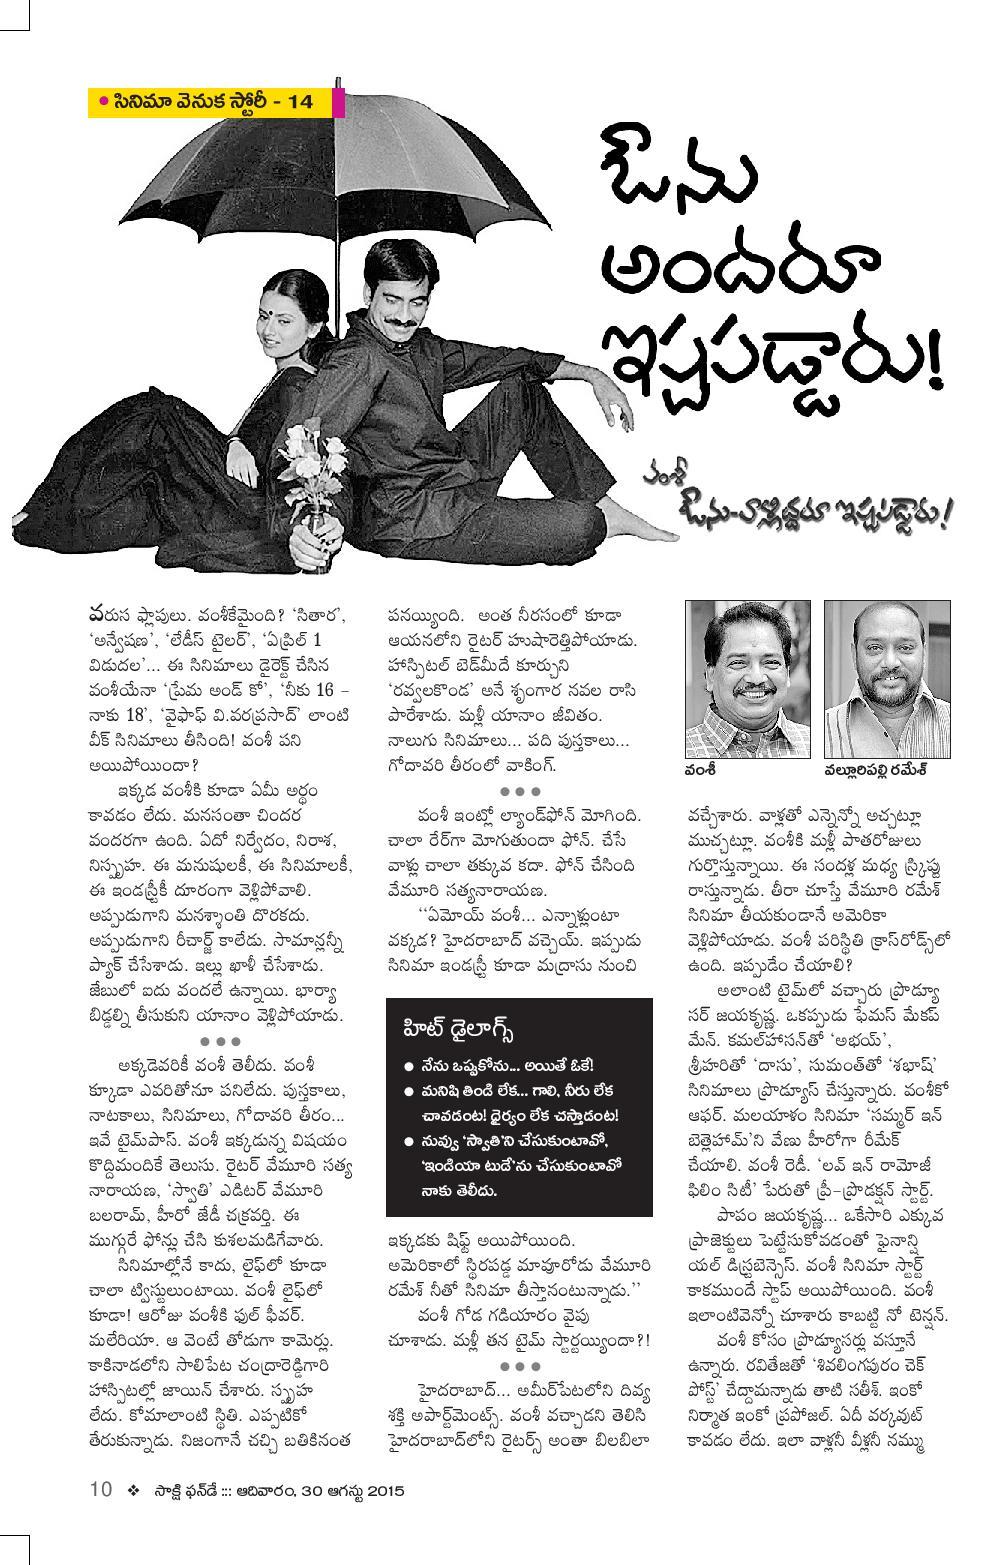 Cinema Venuka Story_Avunu Valliddaru Istapaddaru_Funday (30-08-2015)-page-001